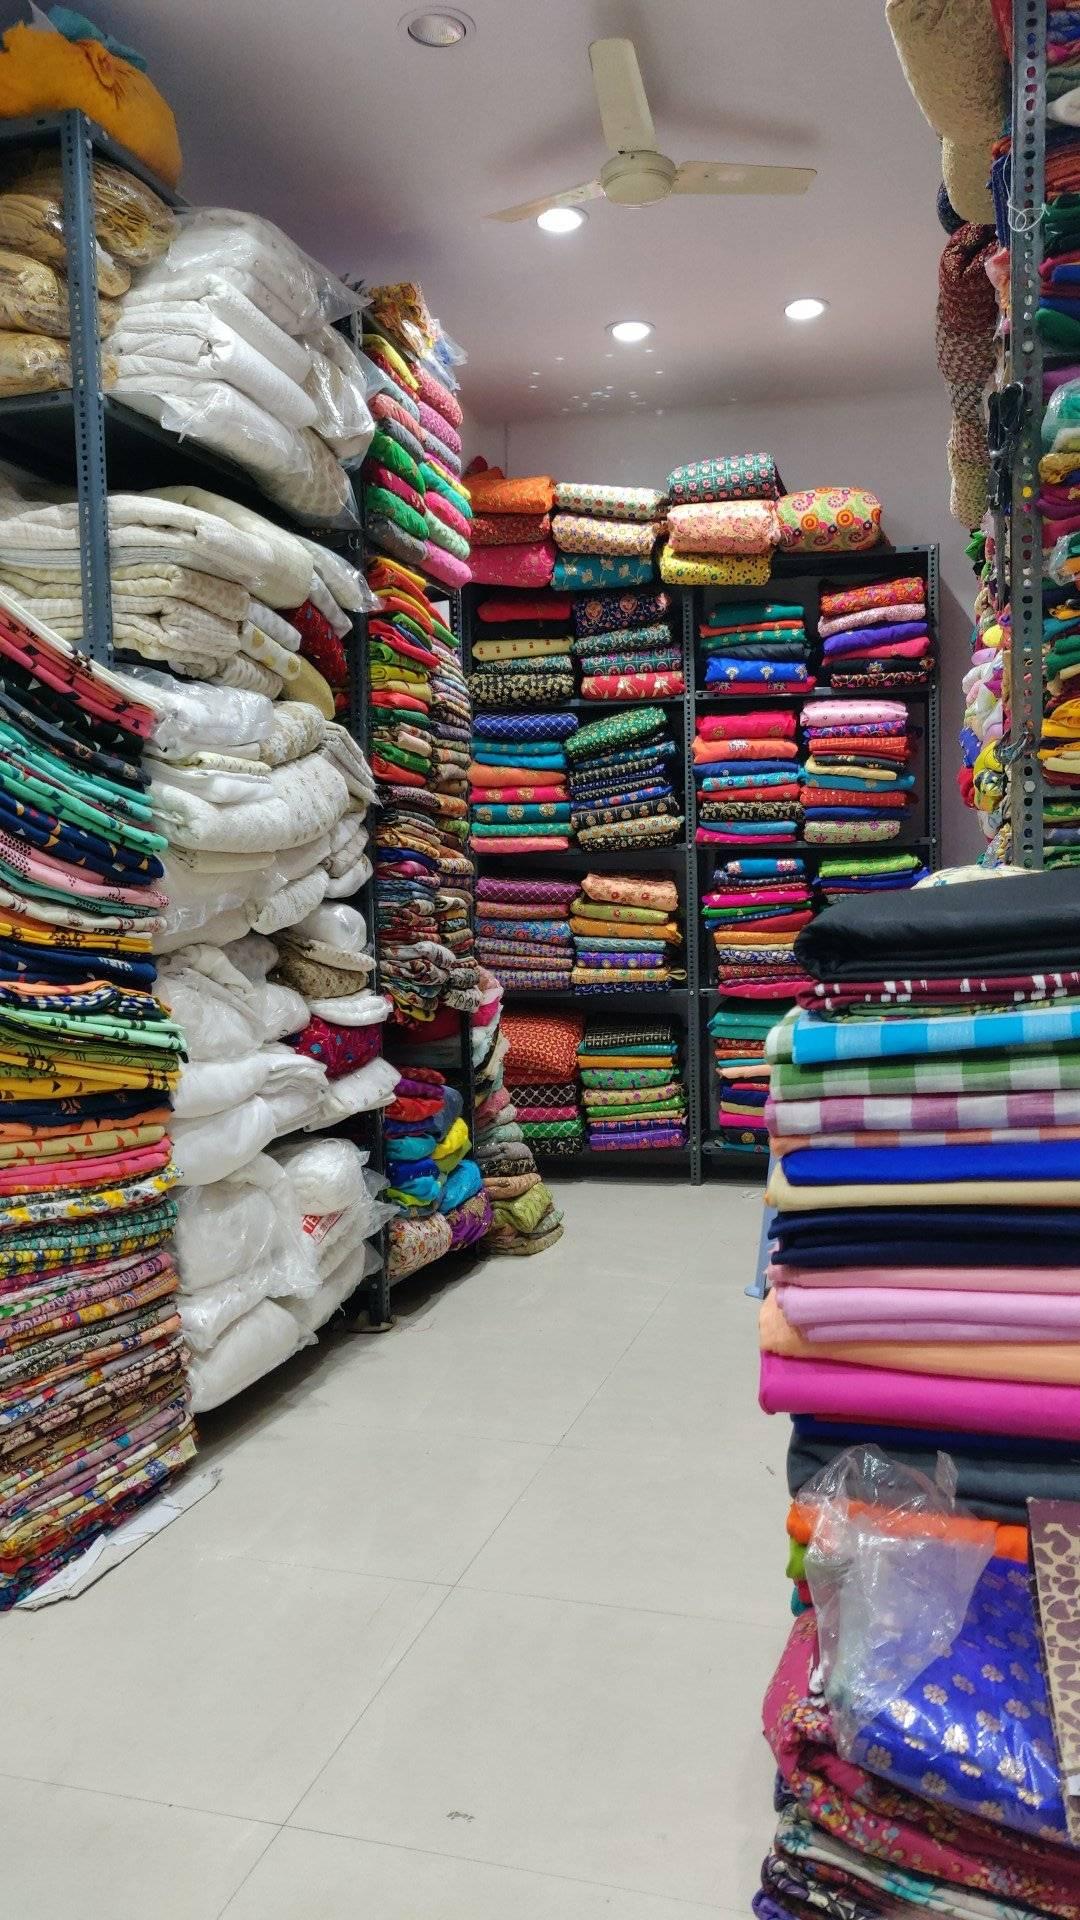 b4451c00b67 Top 100 Ladies Readymade Garment Retailers in Hyderabad - Best Women ...